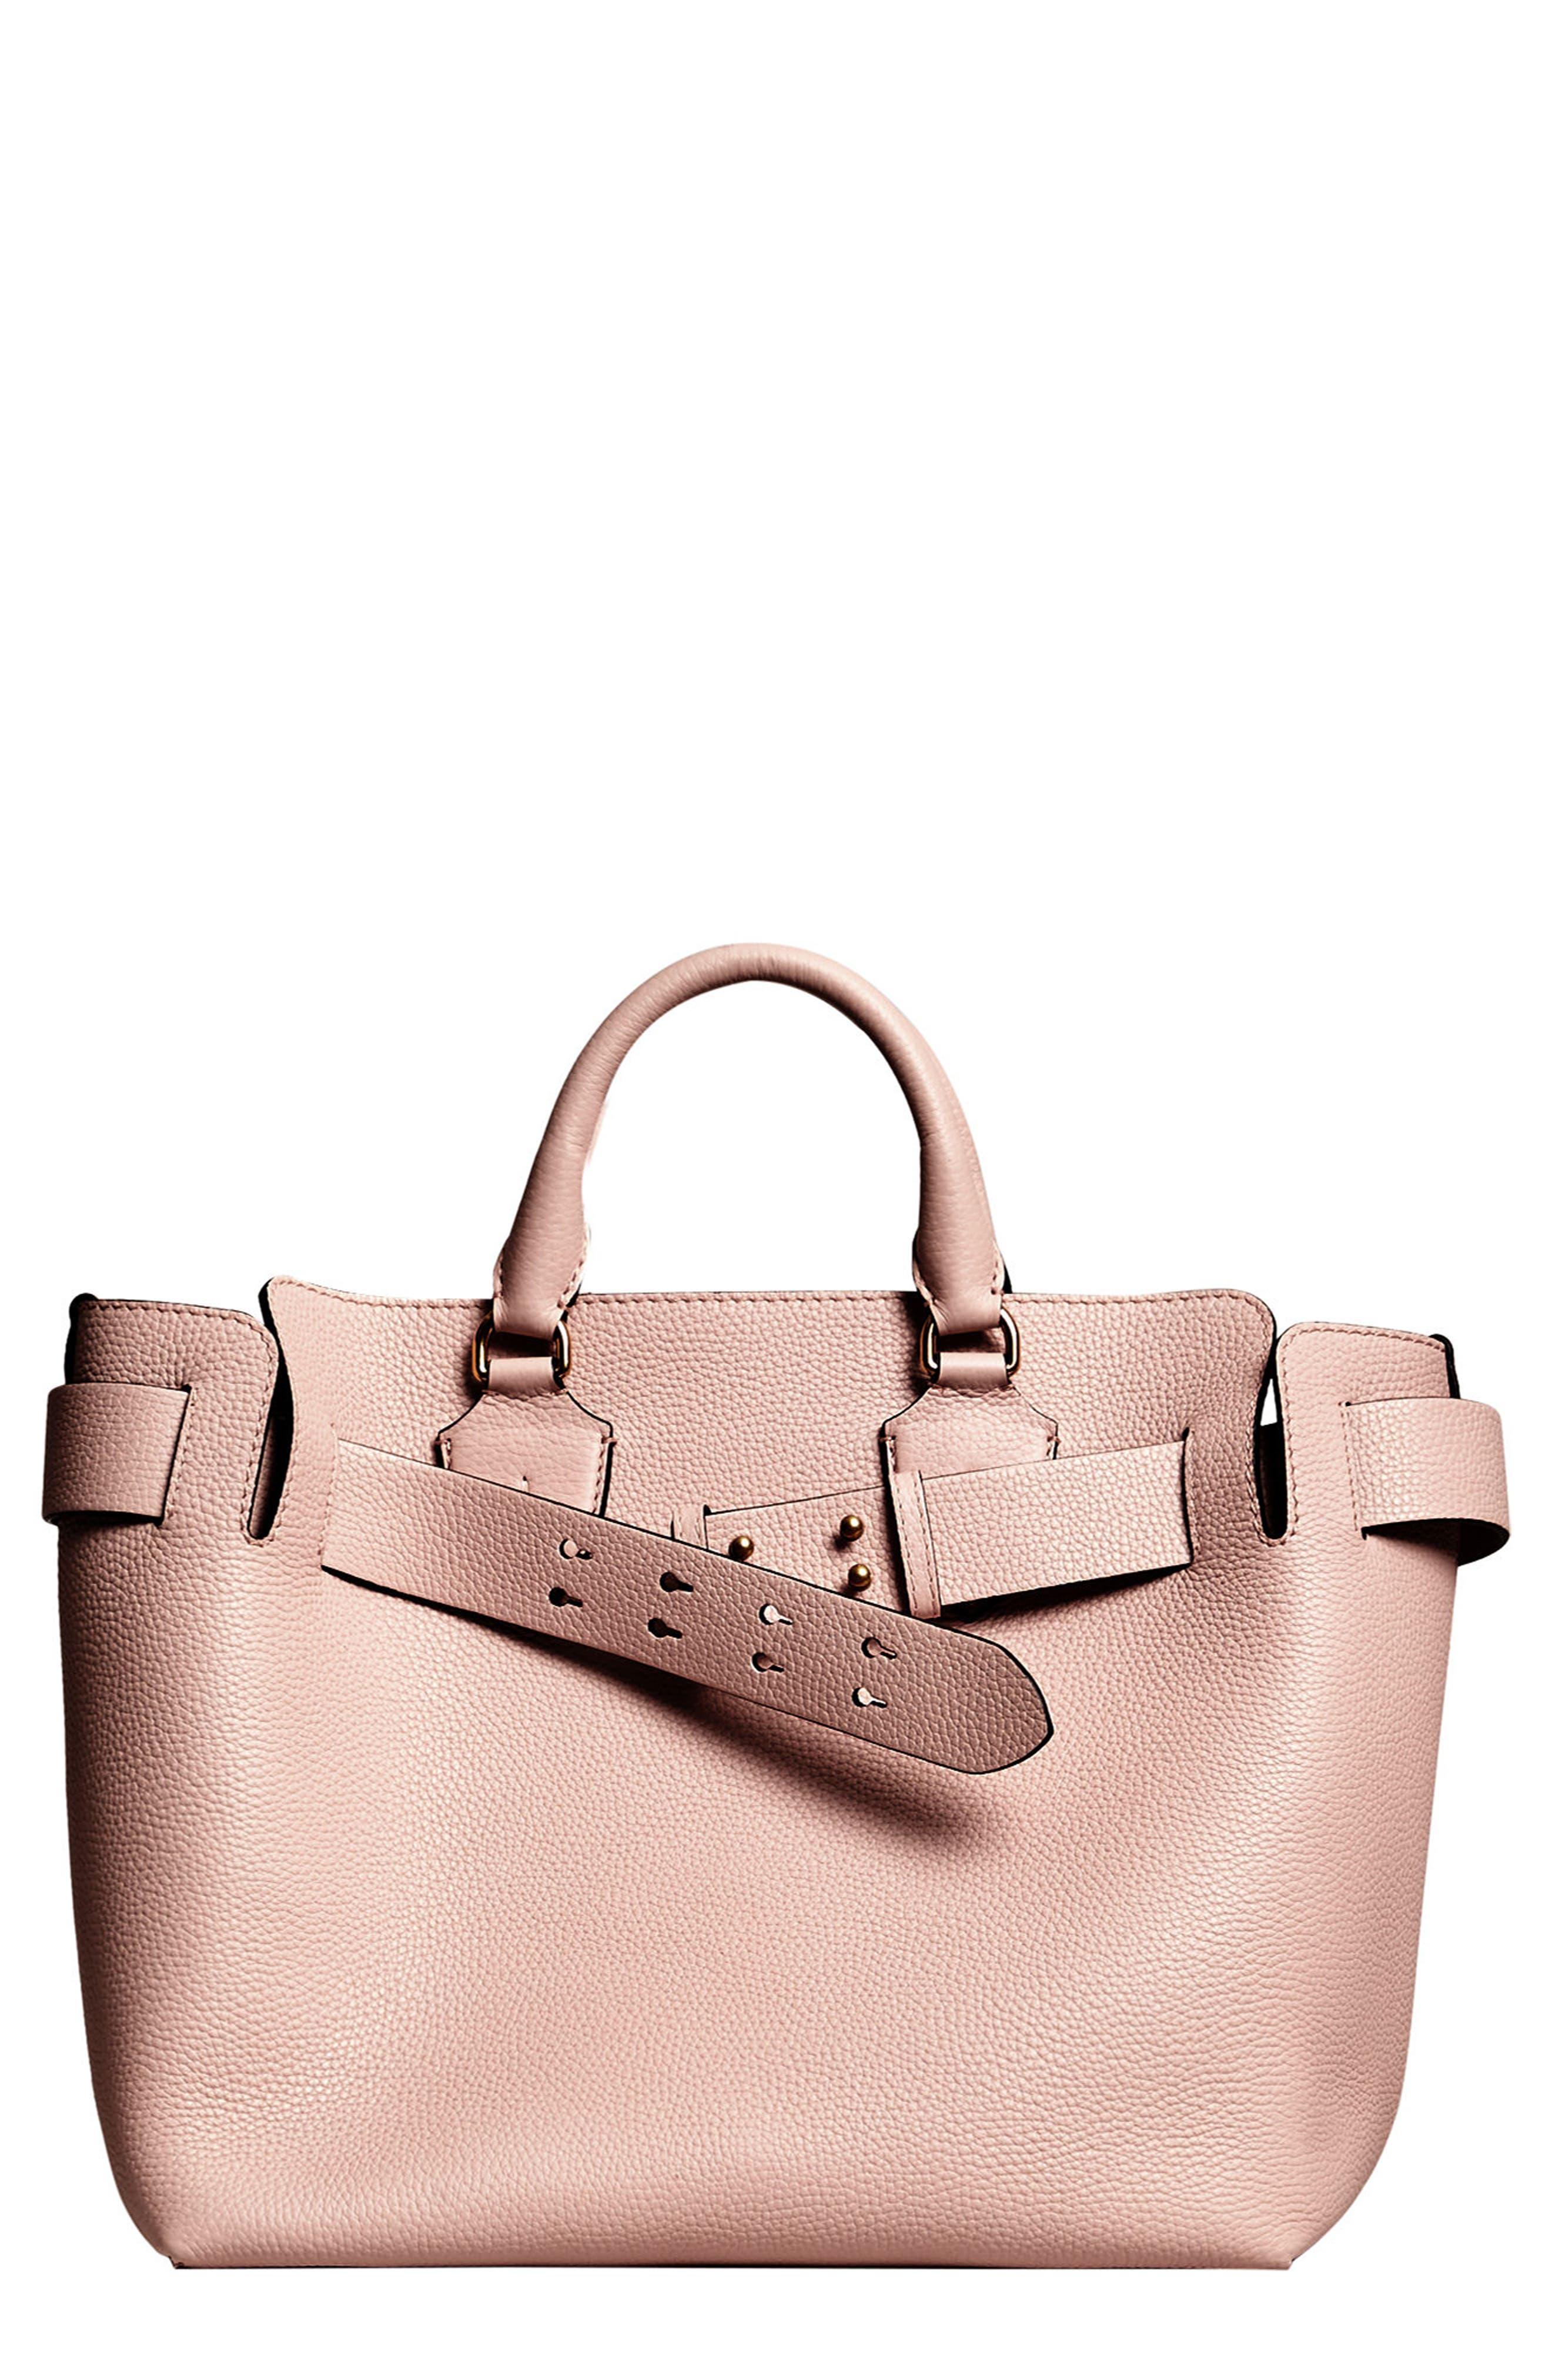 Medium Belt Bag Leather Tote,                         Main,                         color, PALE ASH ROSE